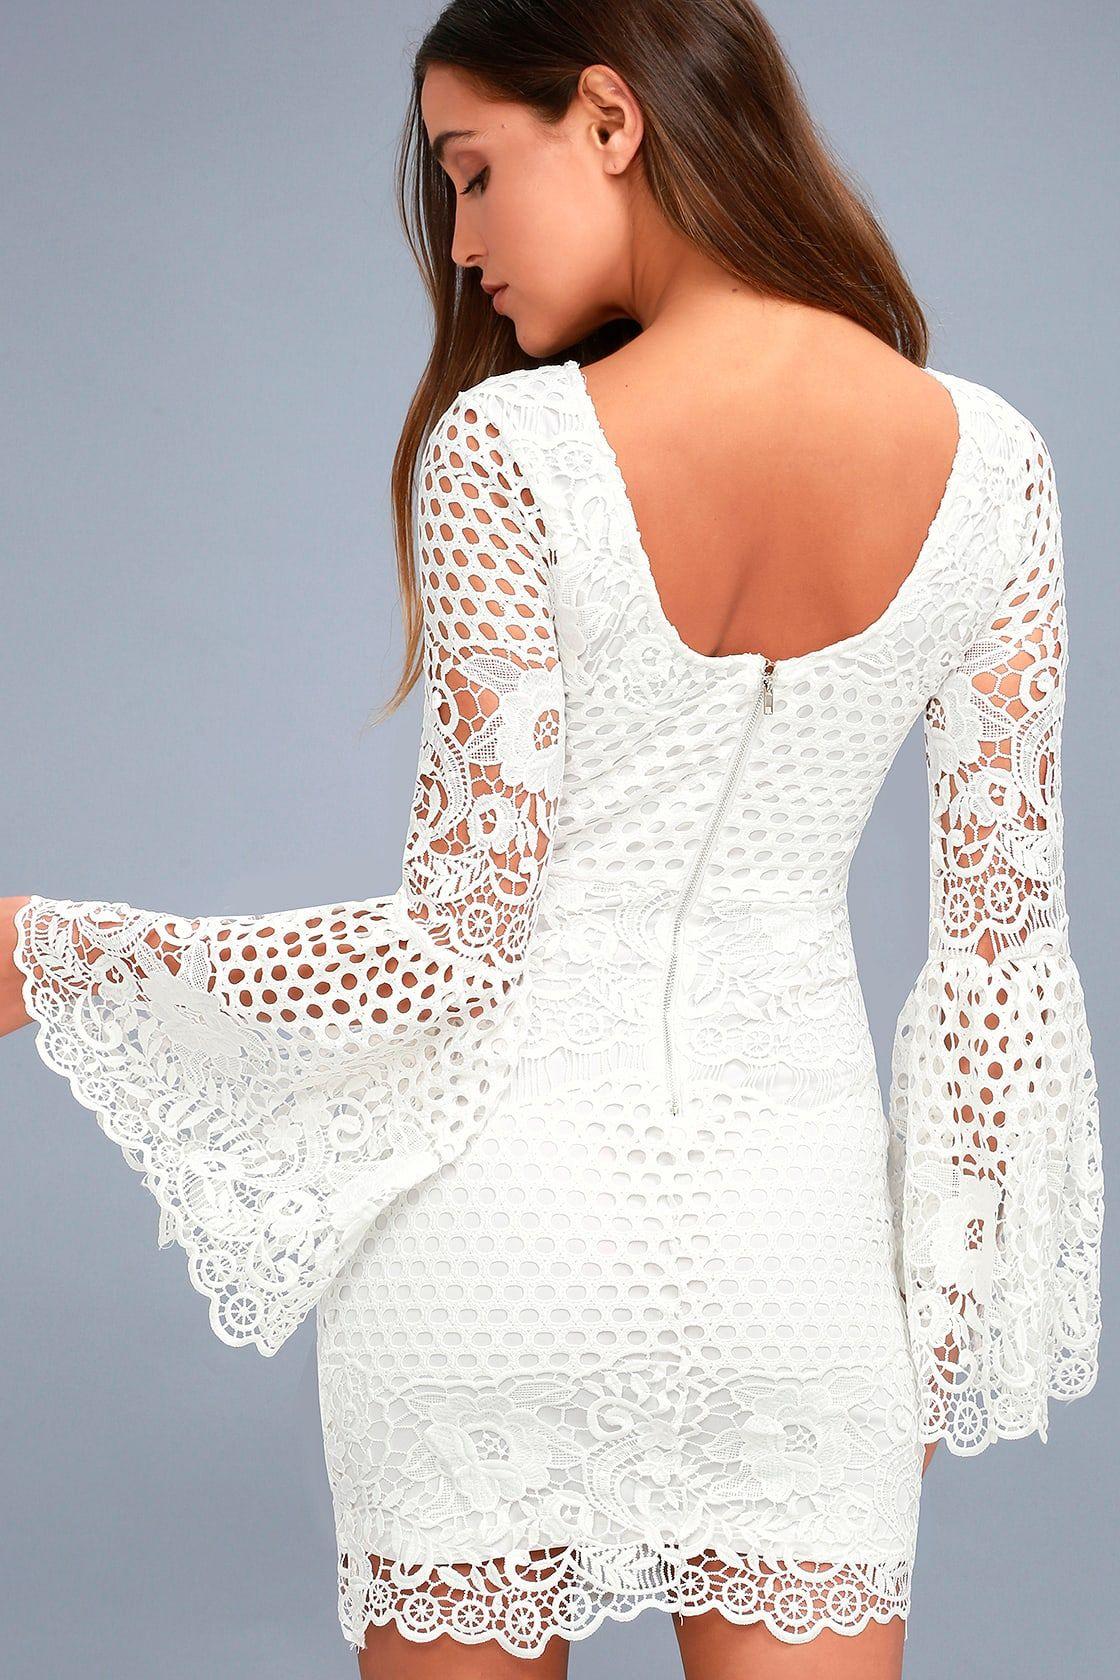 Angelisa White Lace Long Sleeve Dress White Lace Long Sleeve Dress Long Sleeve Lace Dress Lace White Dress [ 1680 x 1120 Pixel ]